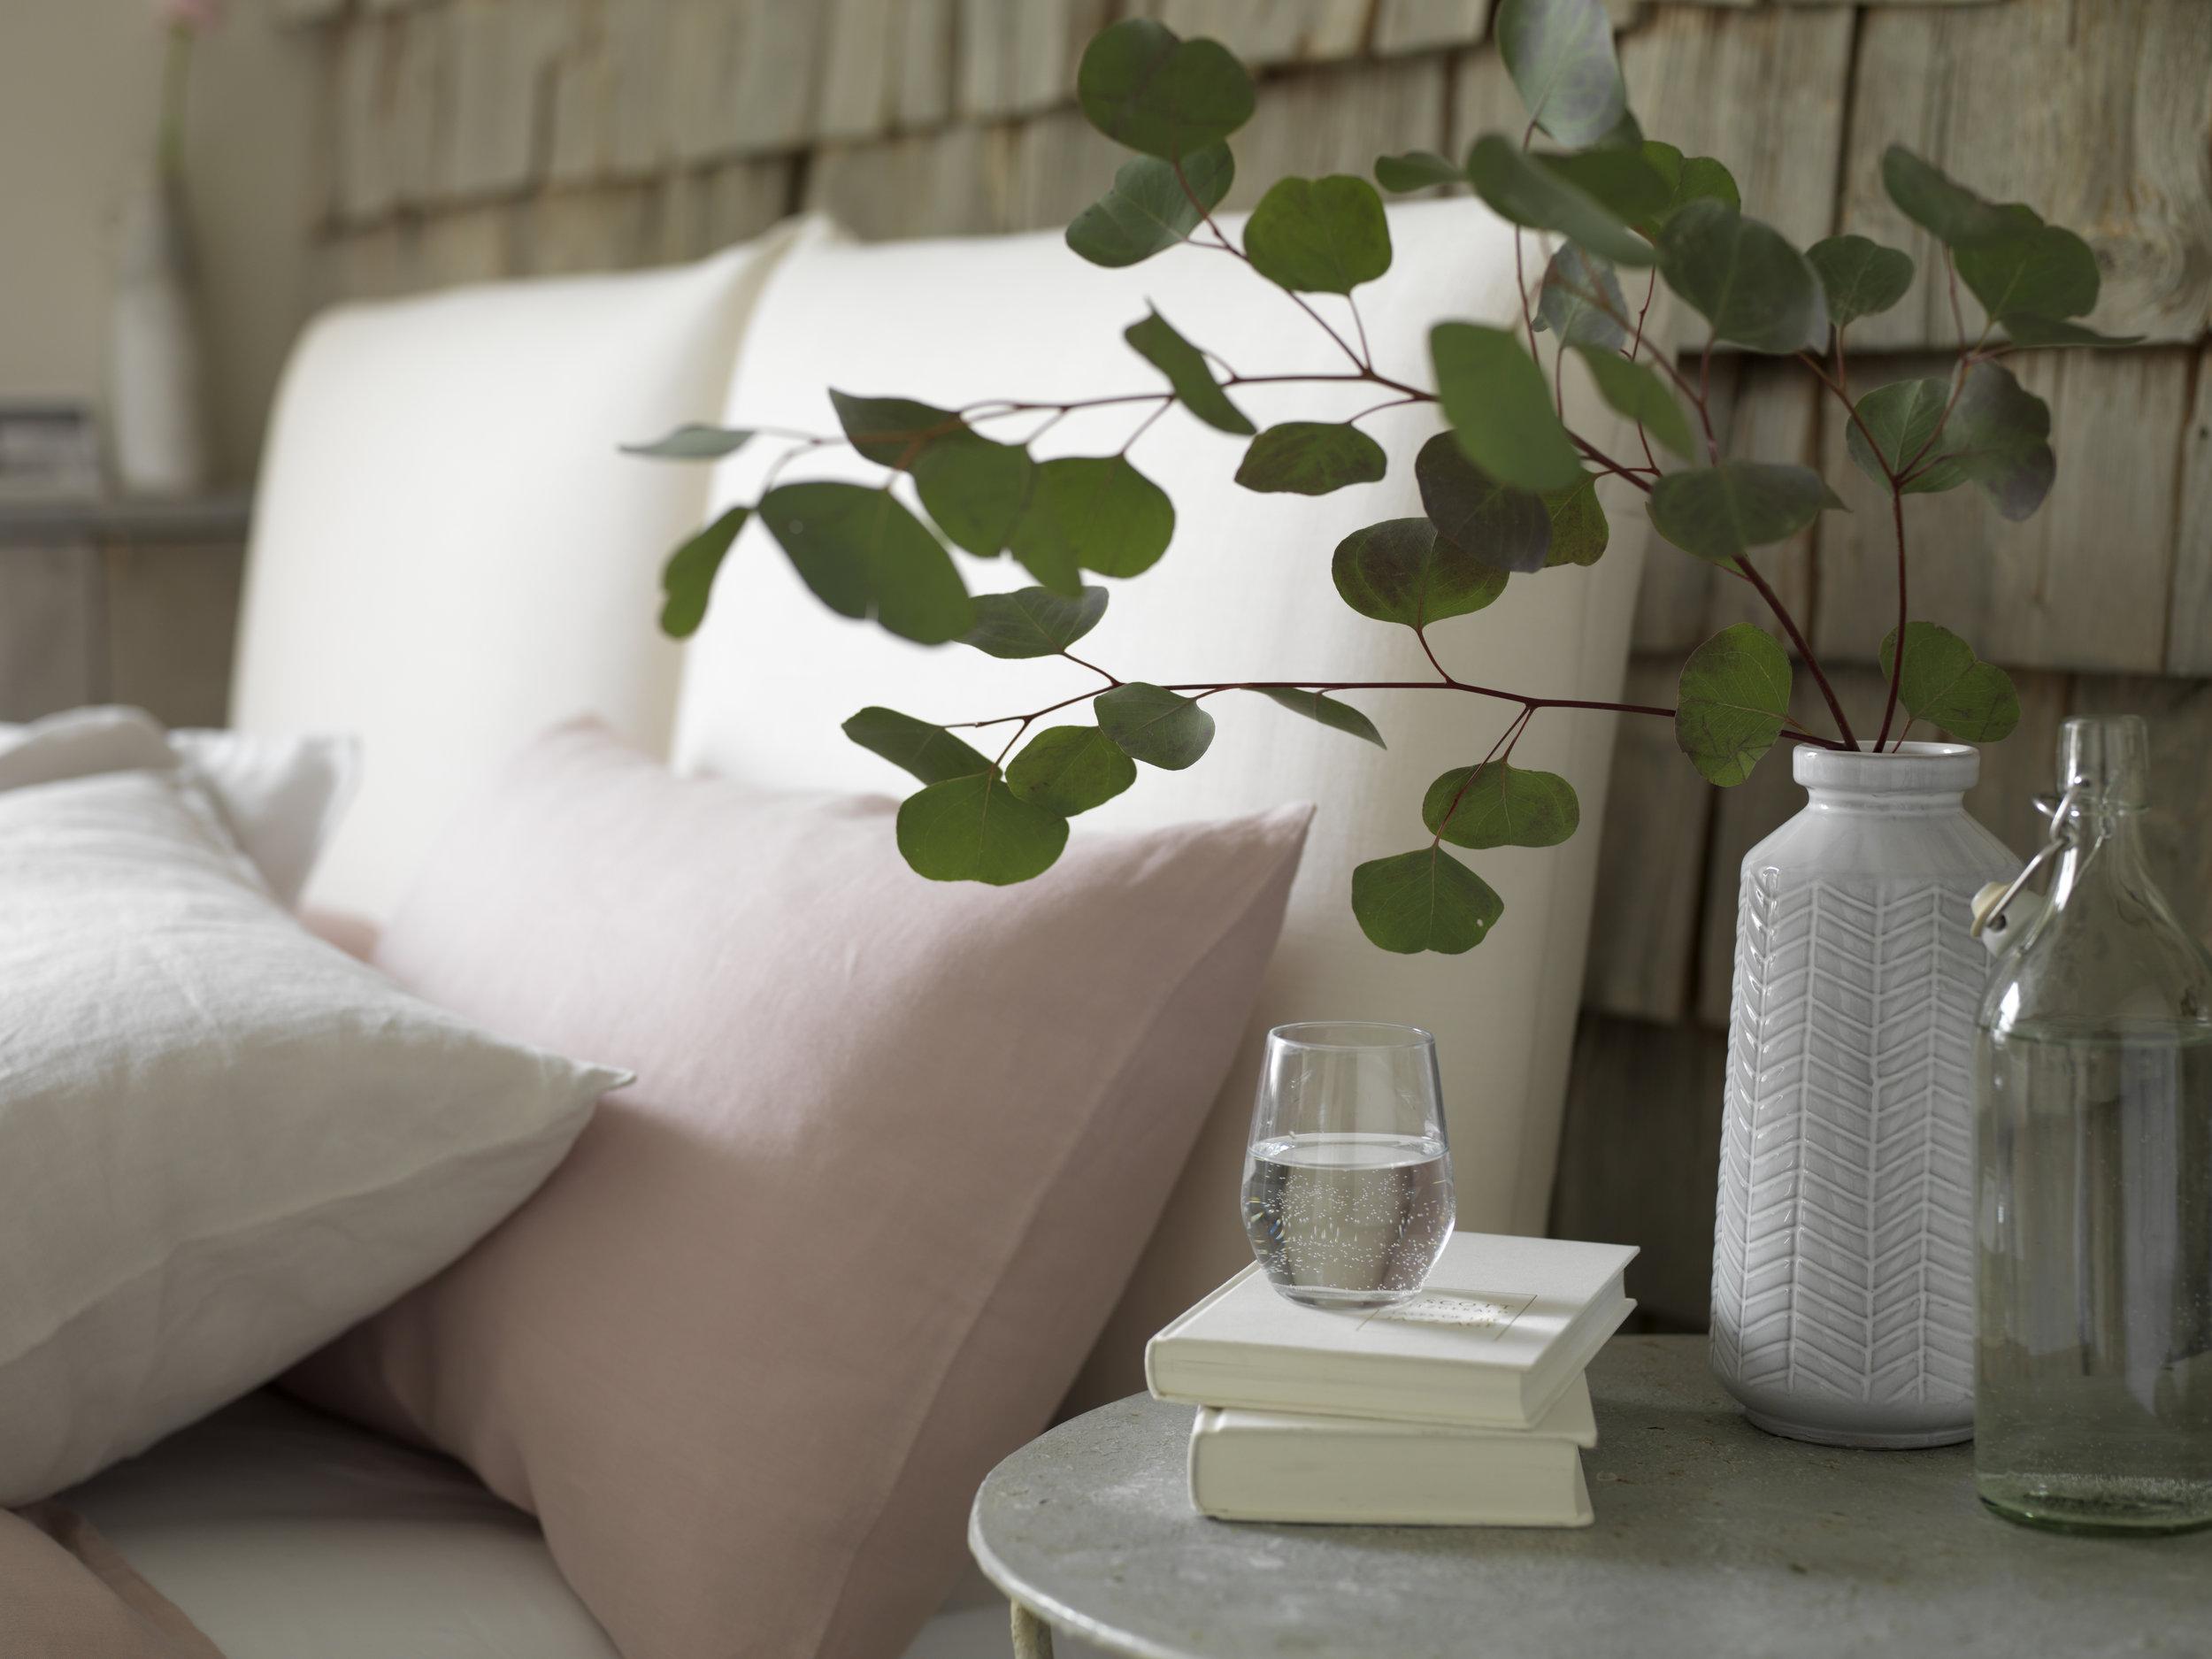 Willow-Headboard-Shell-Lifestyle-Landscape-2.jpg